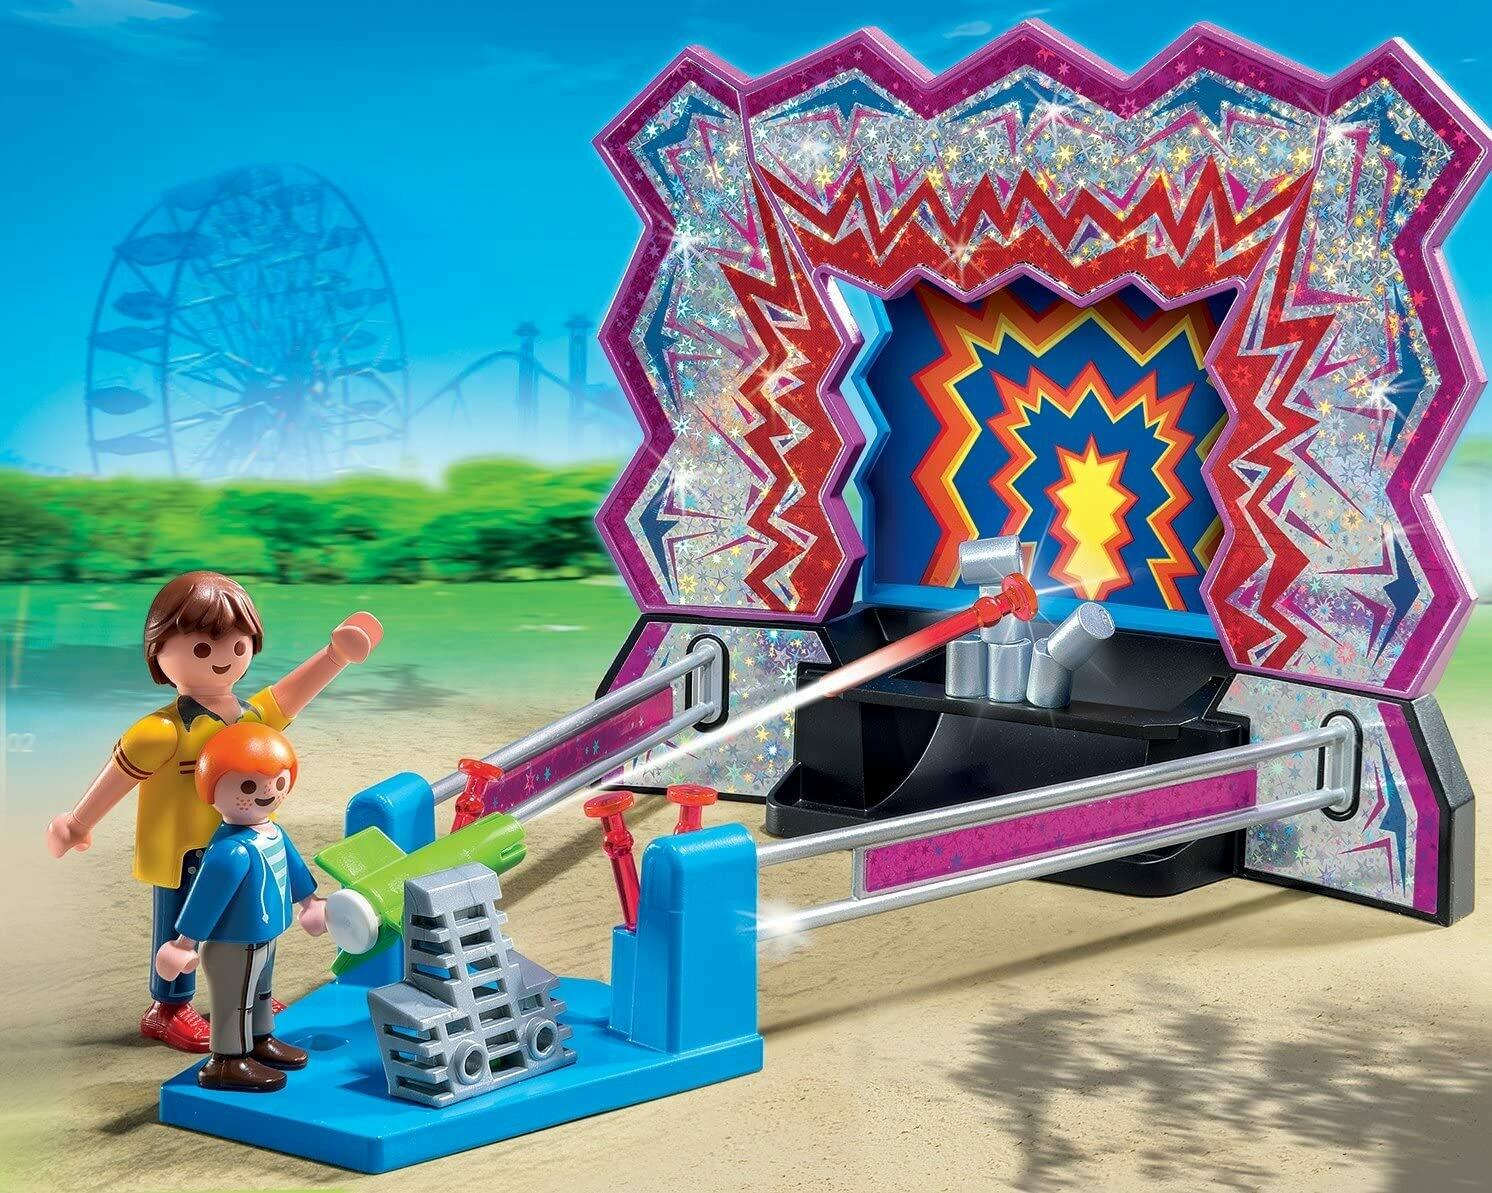 Playmobil; Tin Can Shooting Game